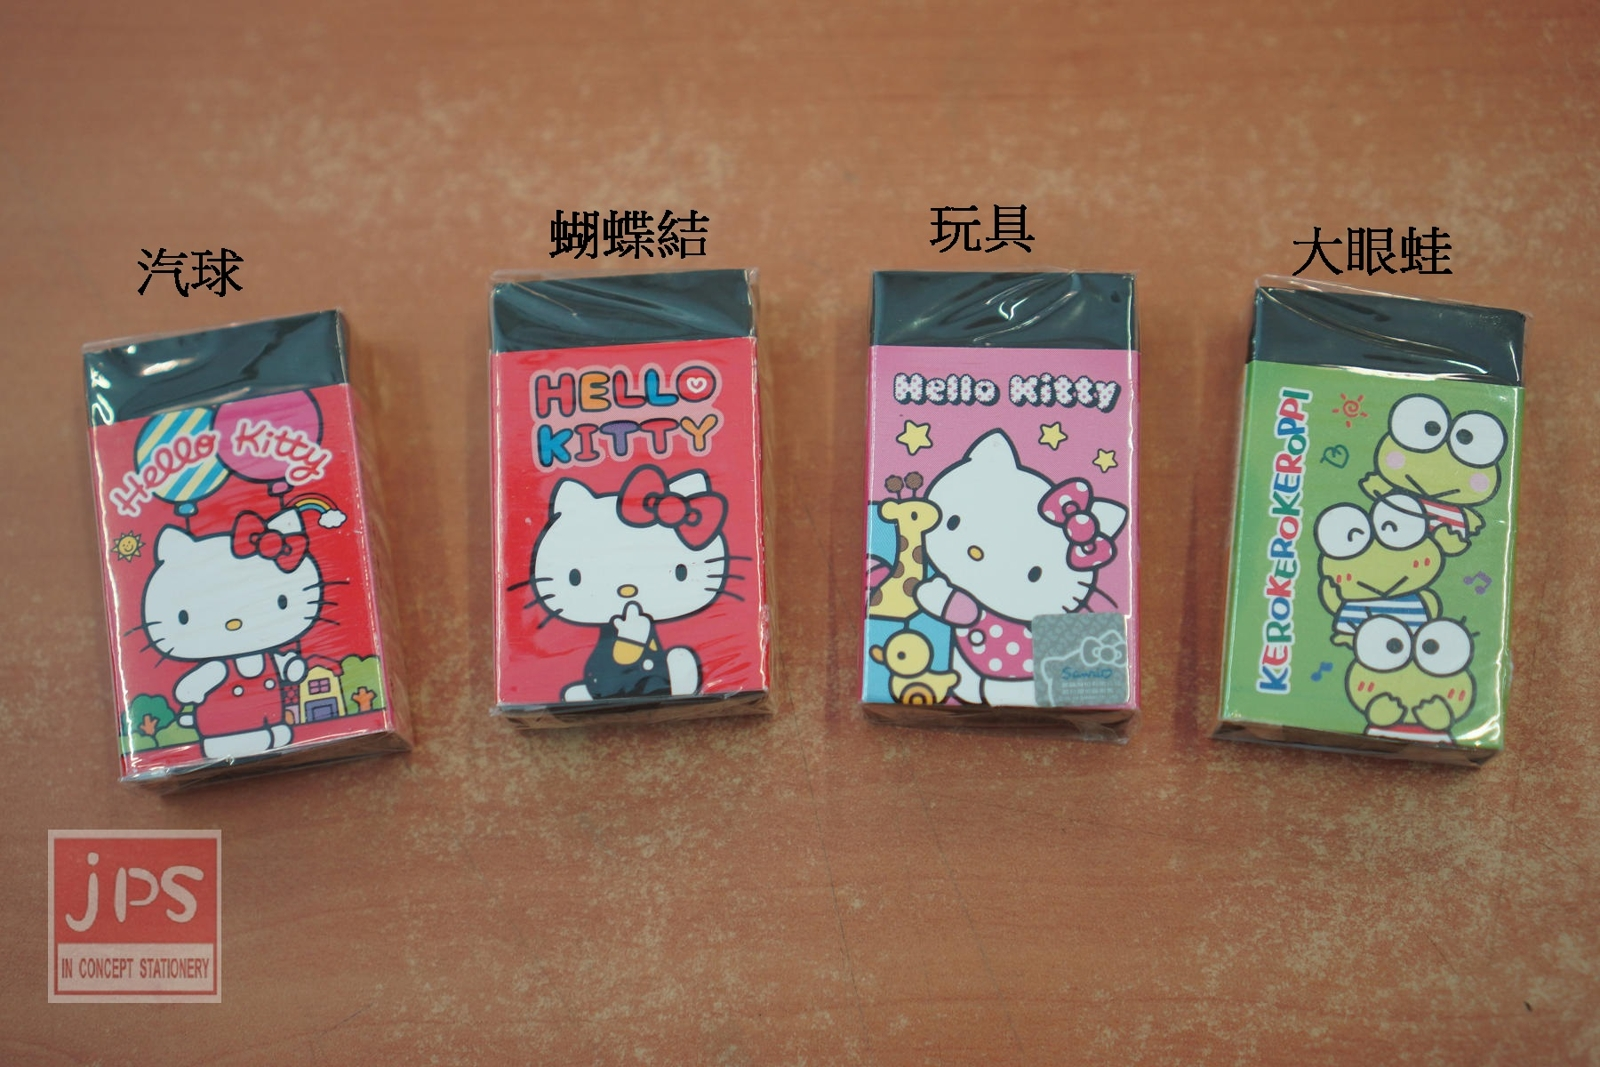 Hello Kitty 大眼蛙 環保黑色方塊 橡皮擦 (汽球&蝴蝶結&玩具&大眼蛙)